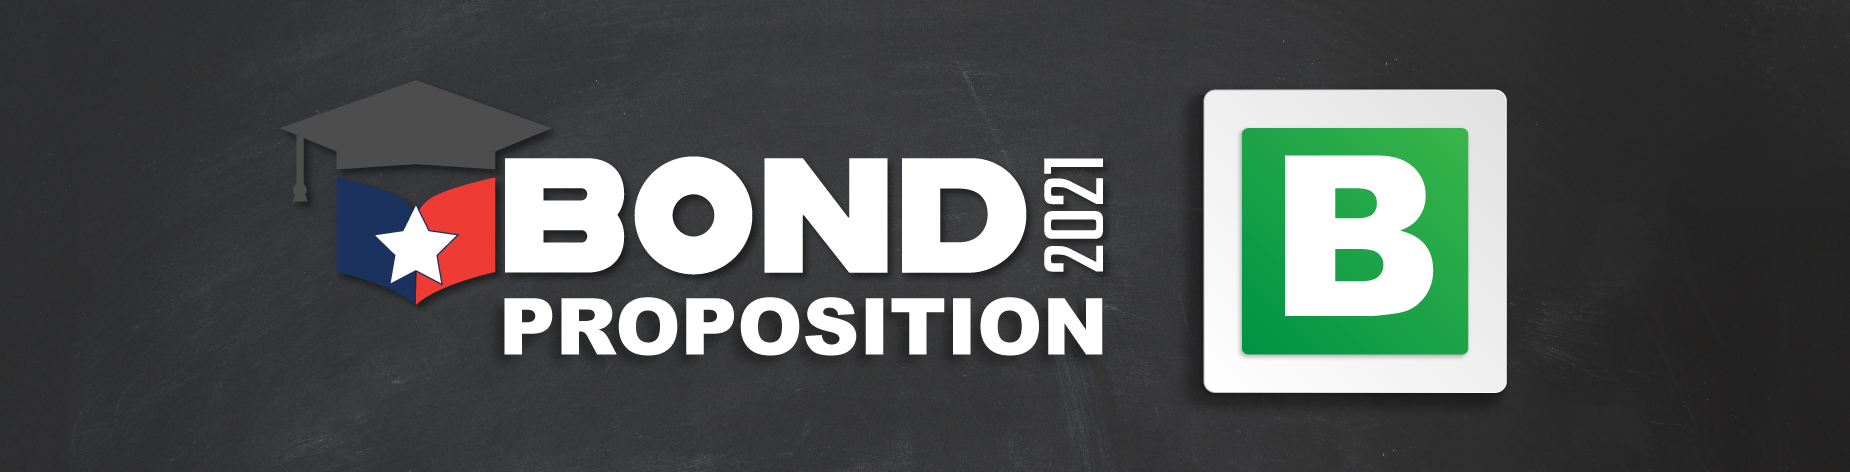 Bond Proposition B Banner